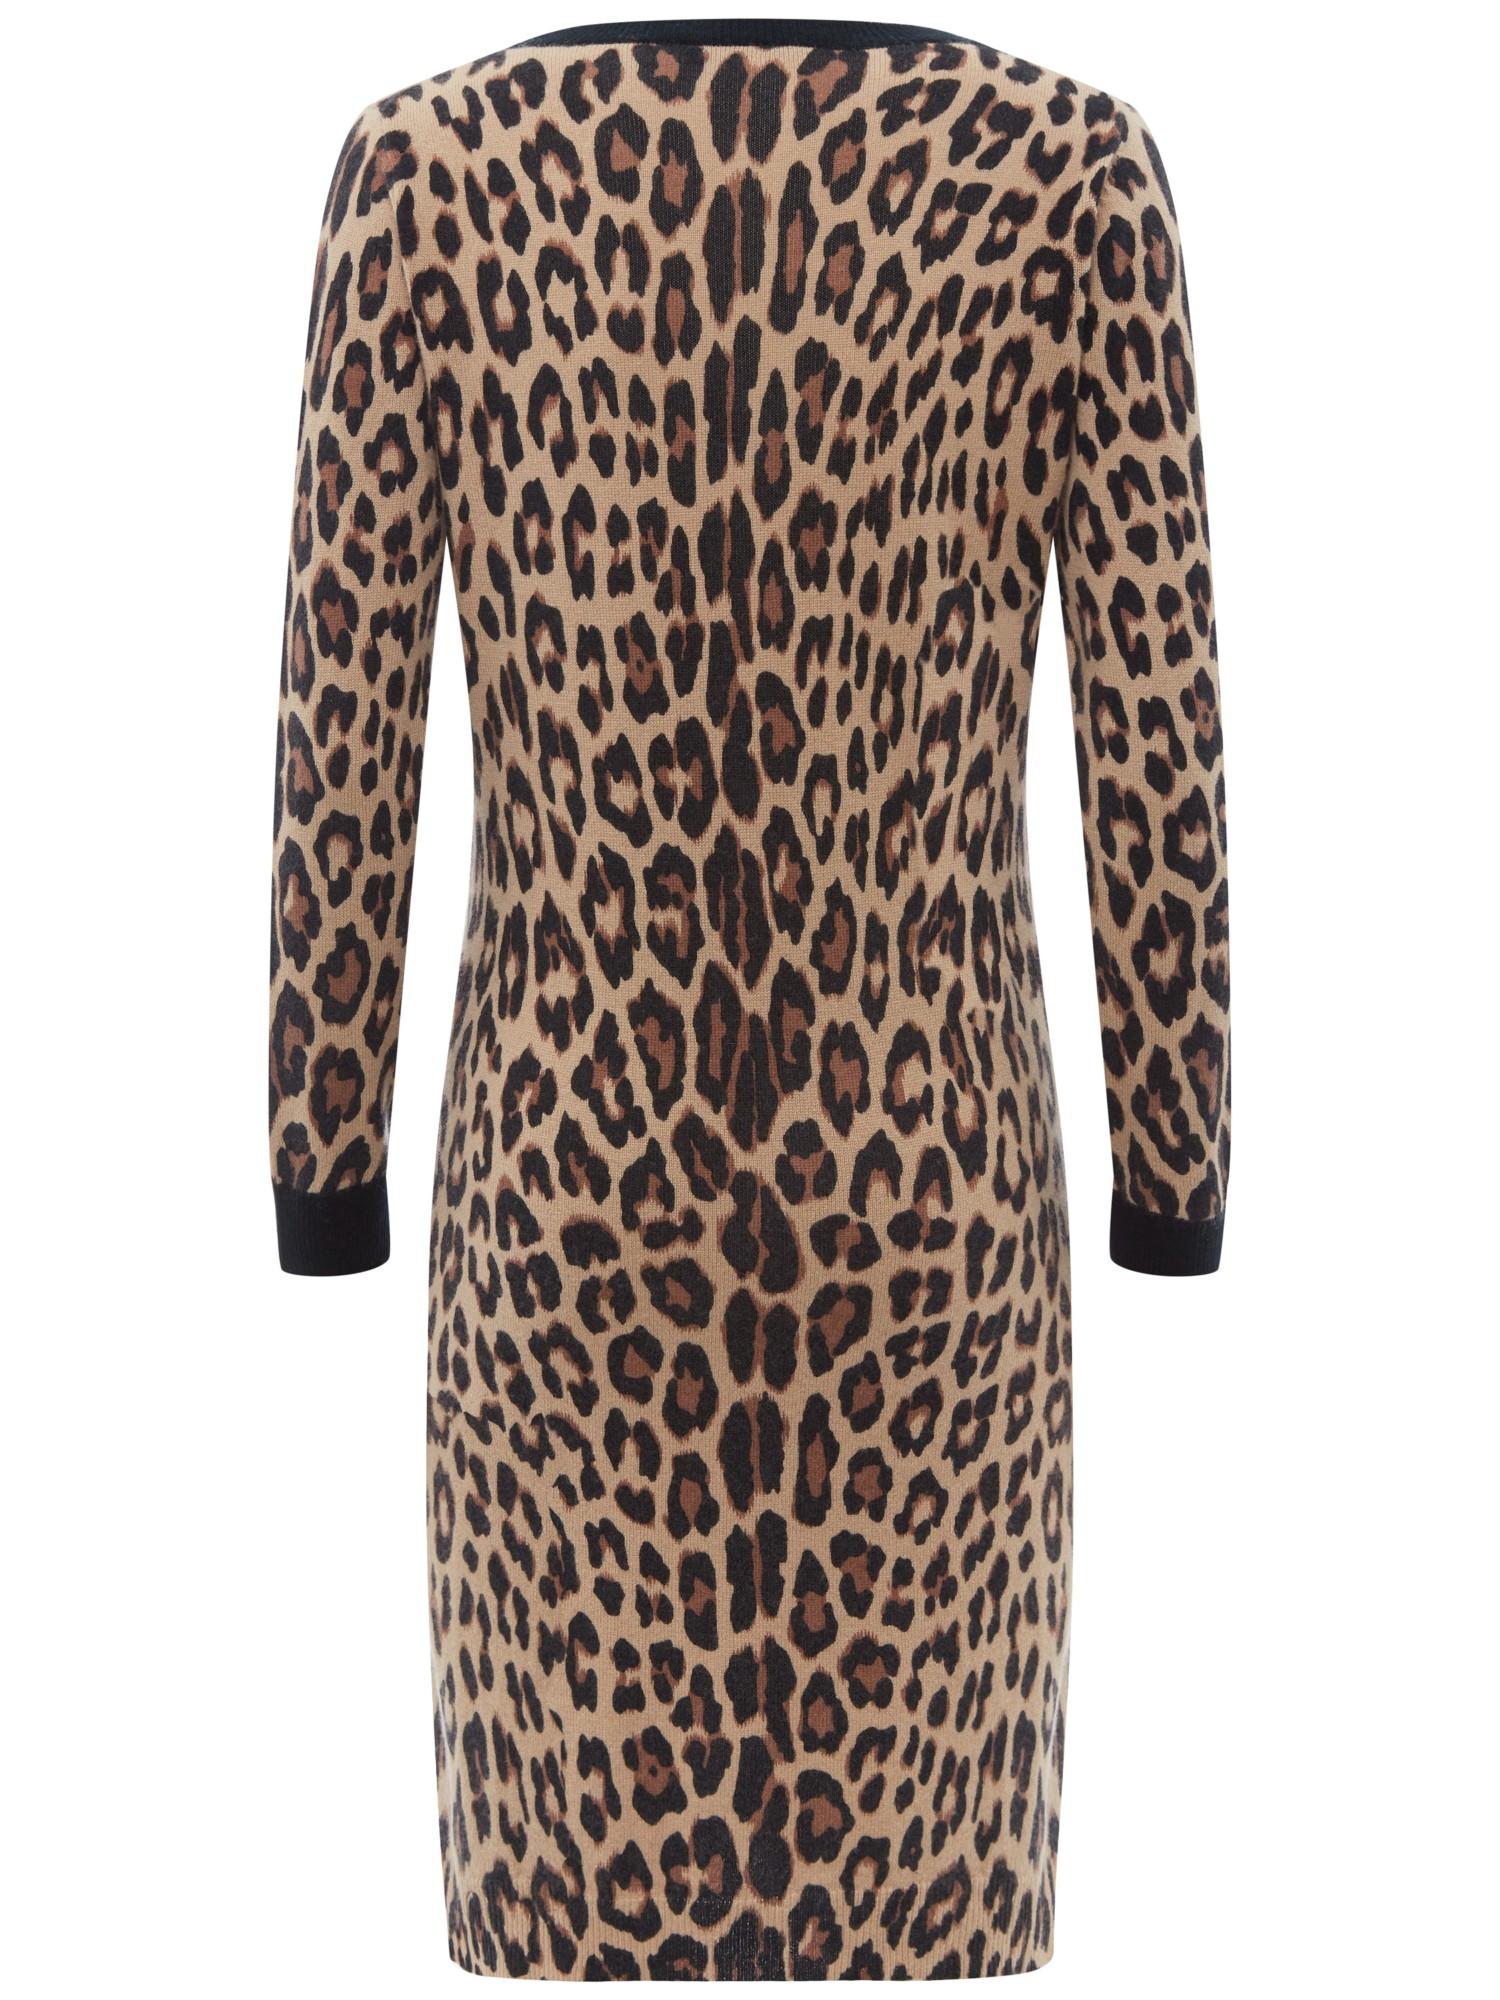 Jaeger Leopard Print Knitted Dress - Lyst 602e5ddf6